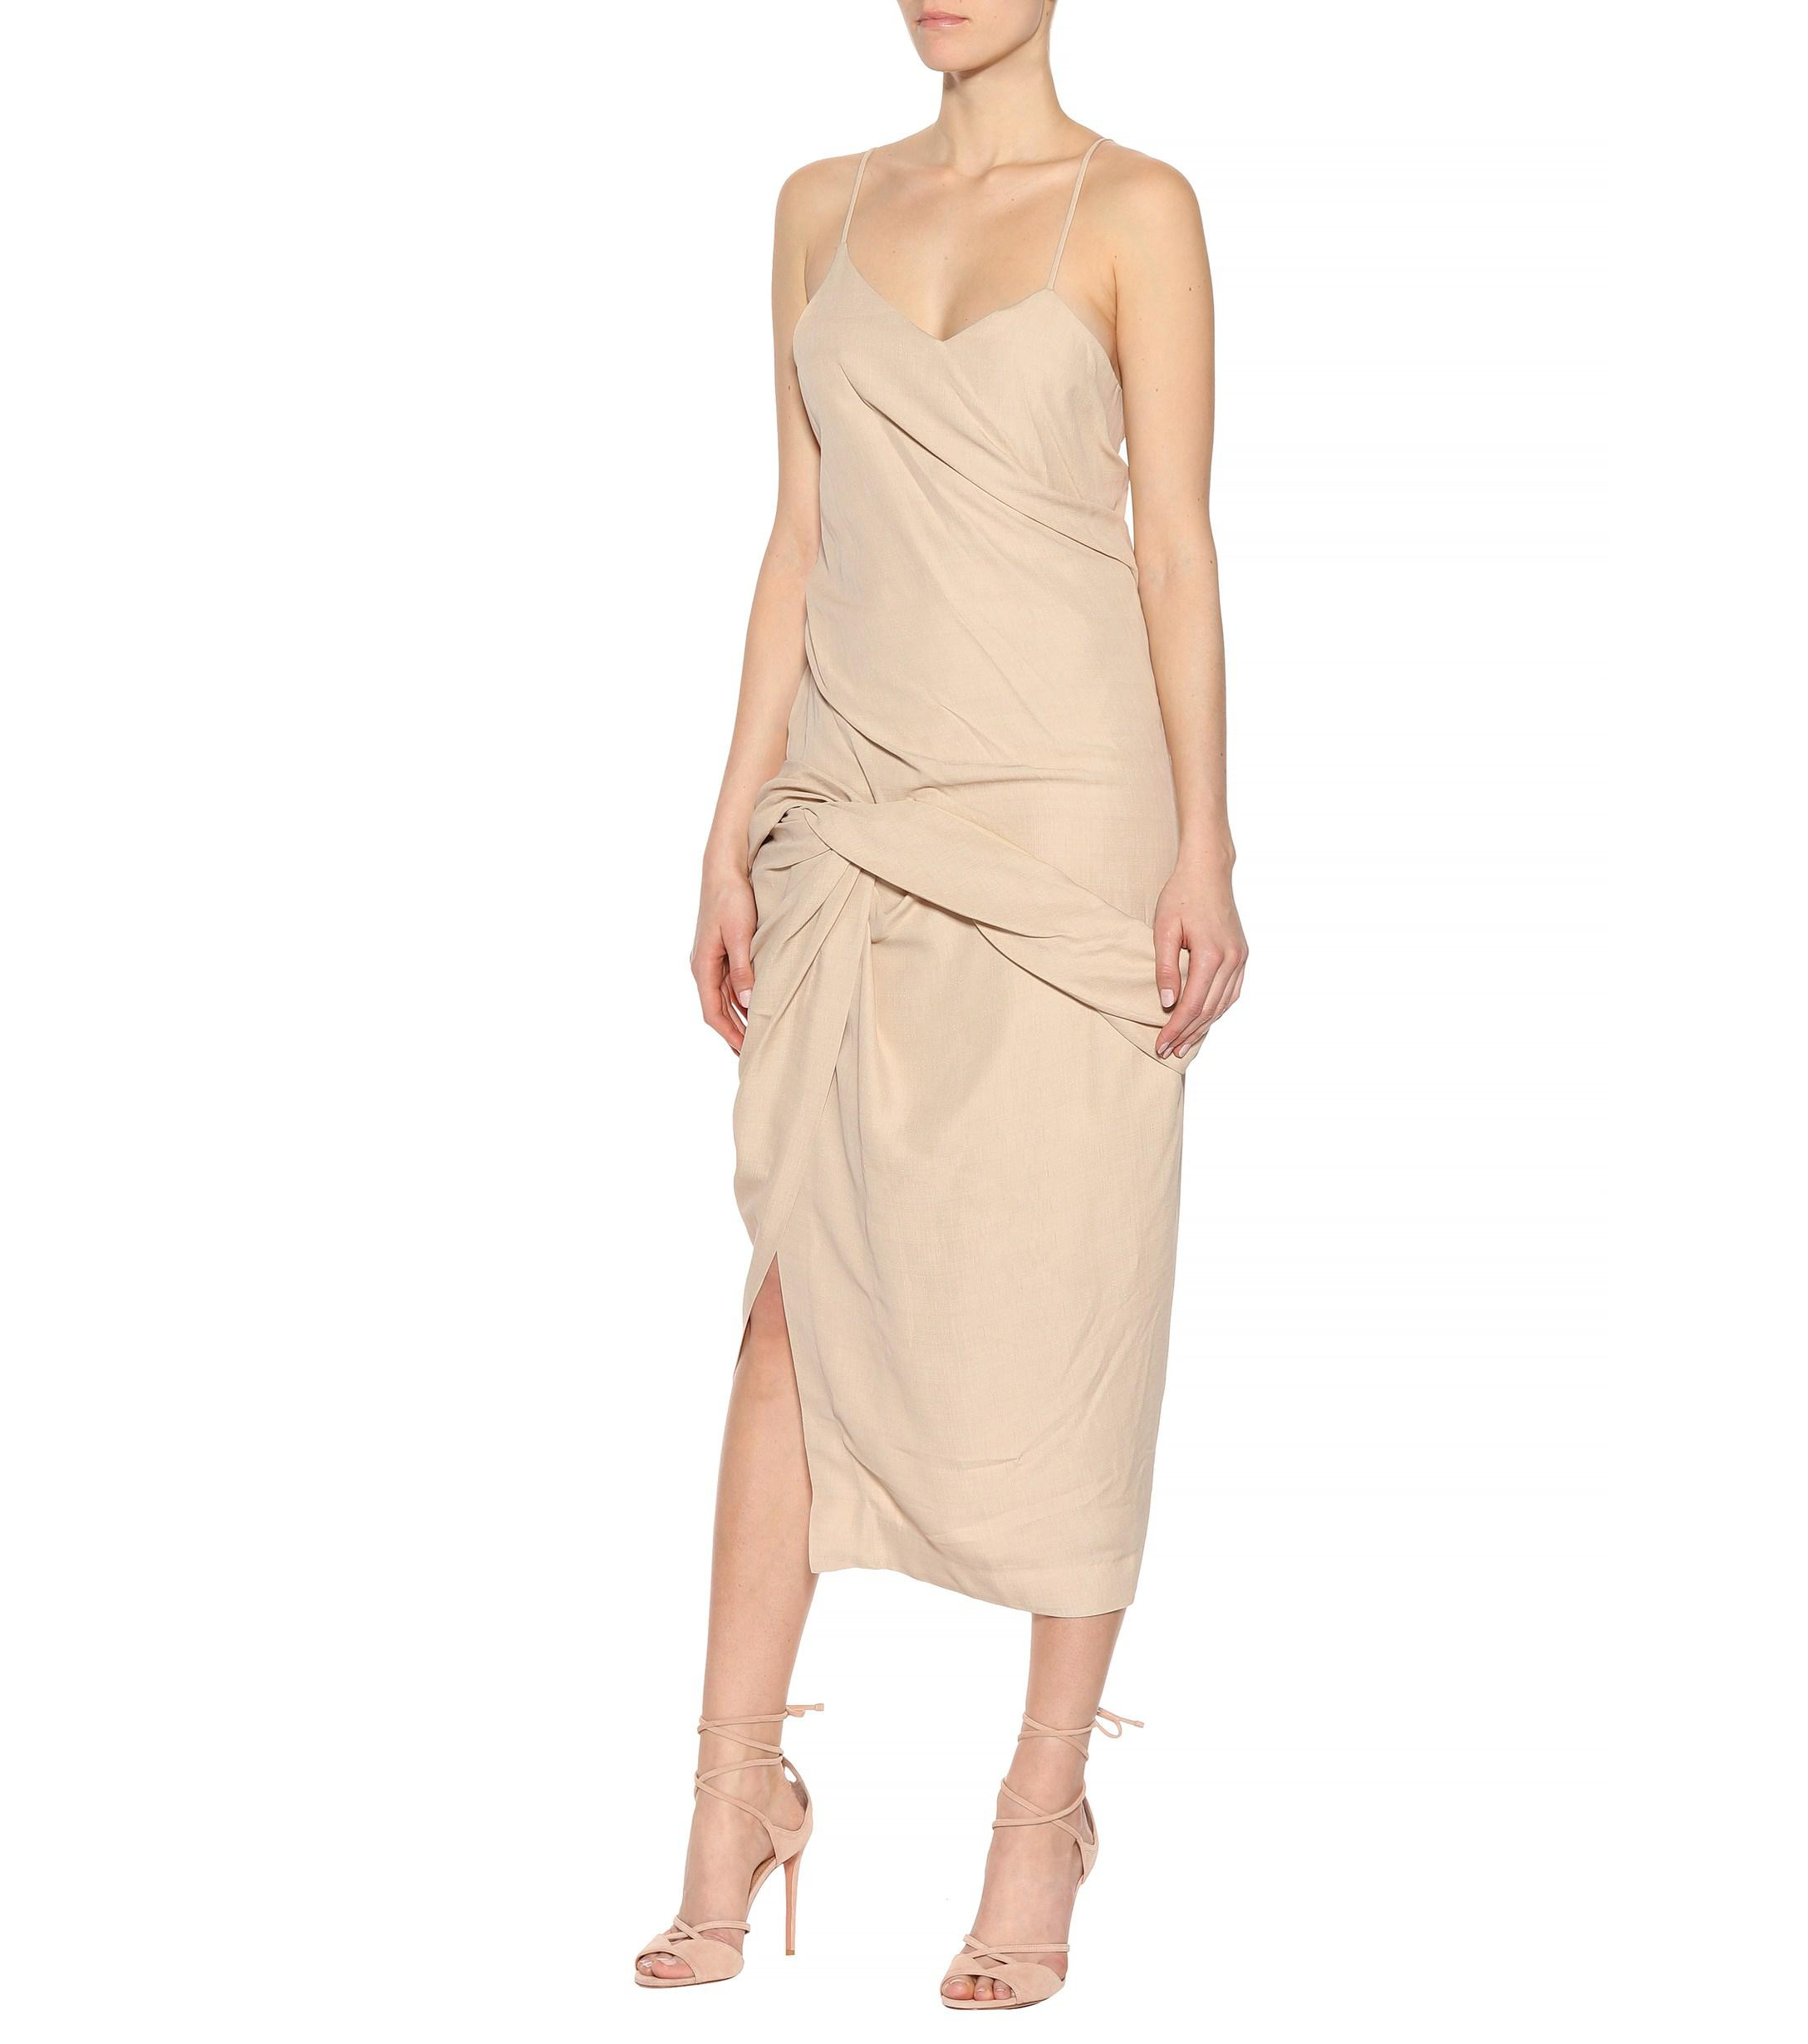 aa3a0c1114 Jacquemus - Natural Coracoa Dress - Lyst. View fullscreen